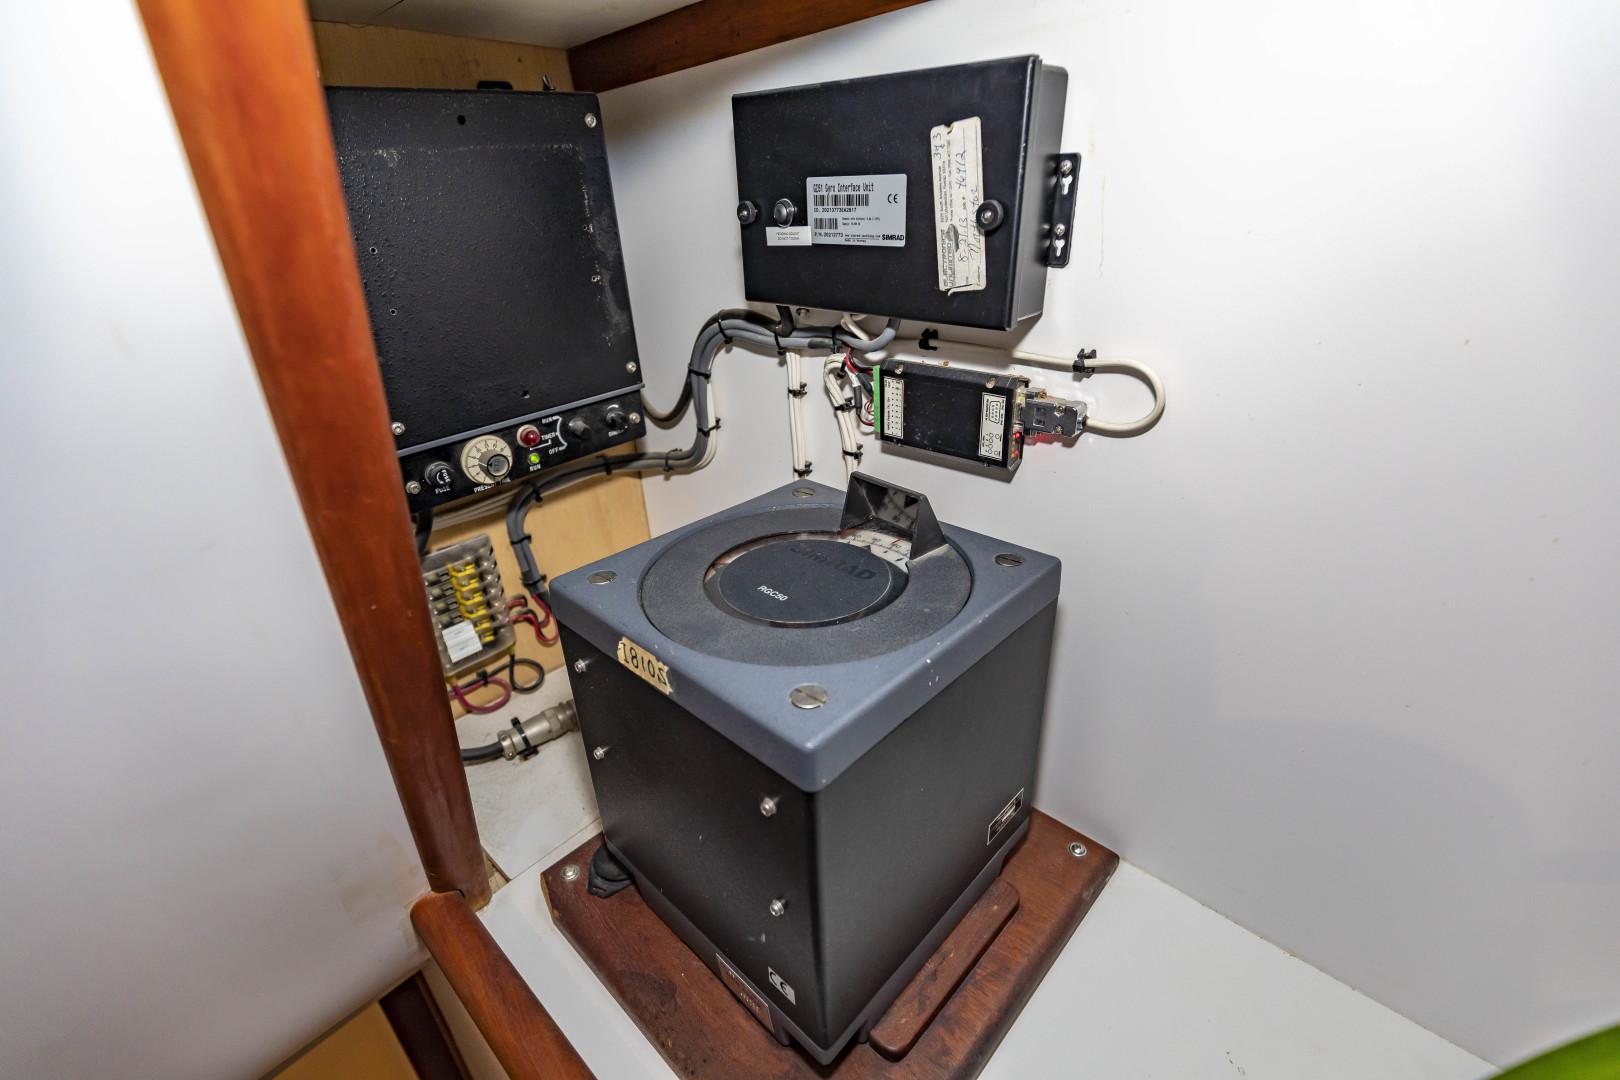 GlassTech-Expedition Yacht 2018-Reset Stuart-Florida-United States-Ships Gyroscopic Compass-1570484 | Thumbnail